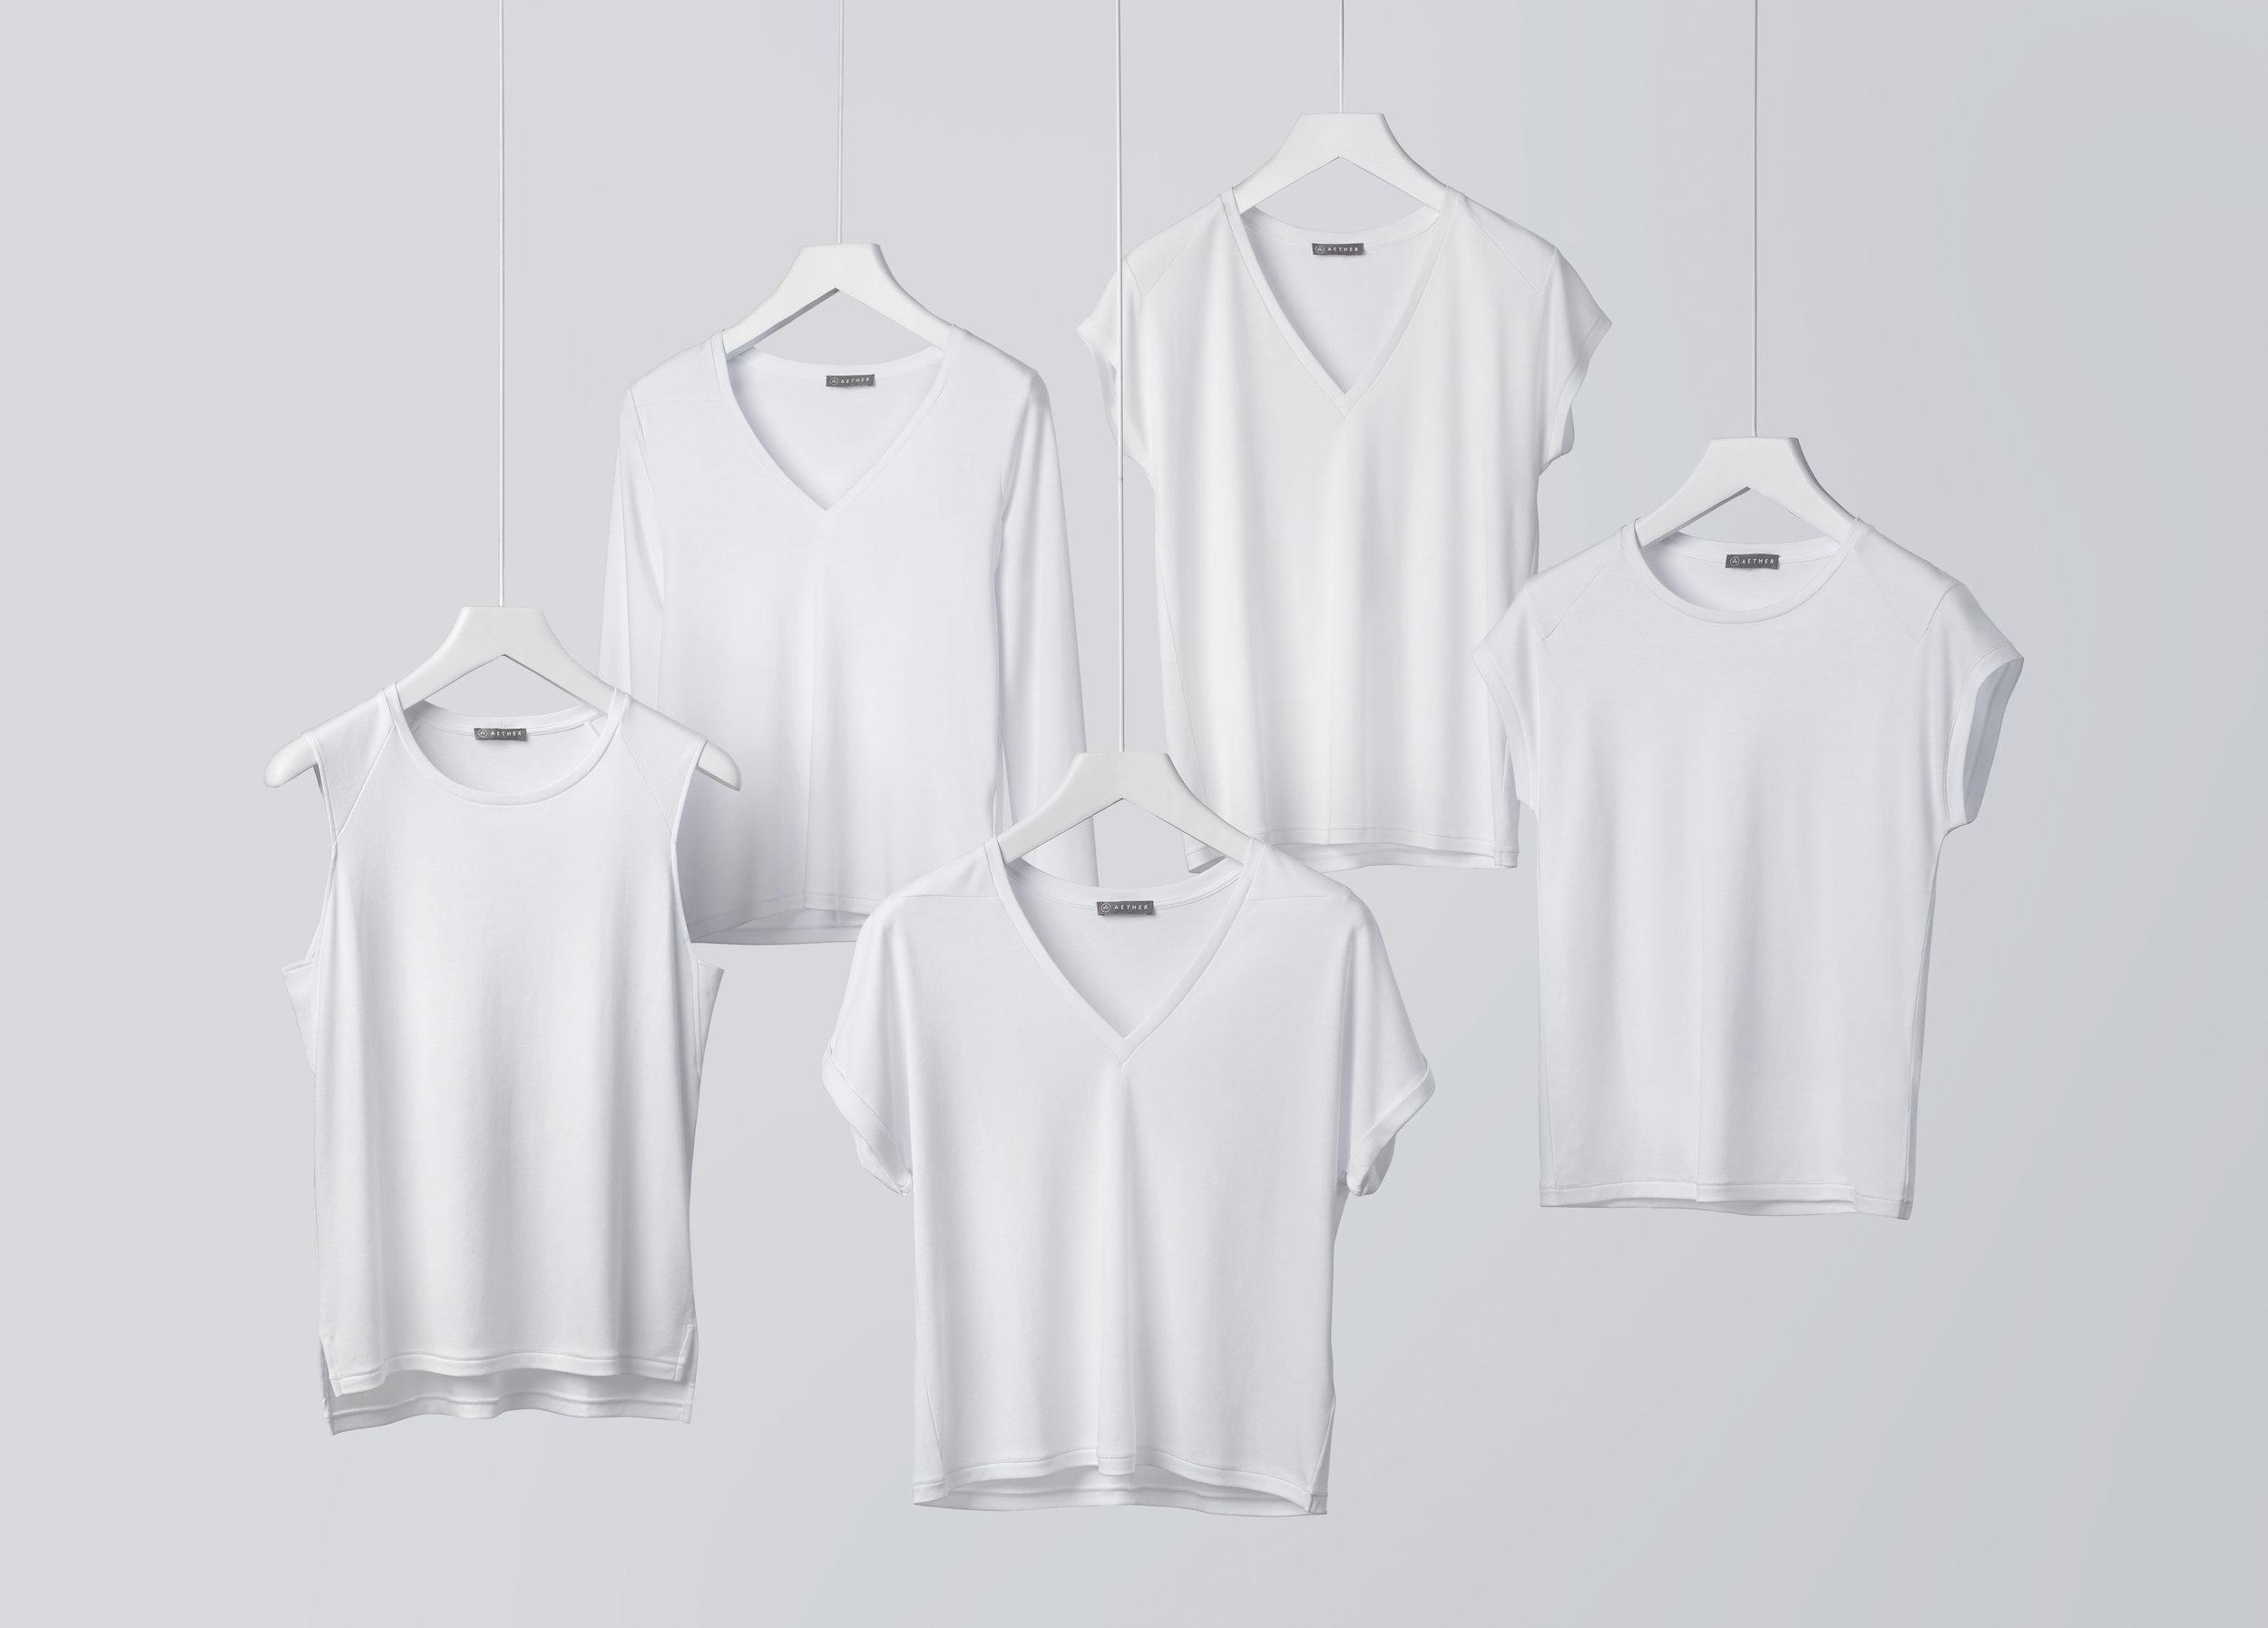 Ideal_Shirt_Collection_Variation_46990_final3.jpg